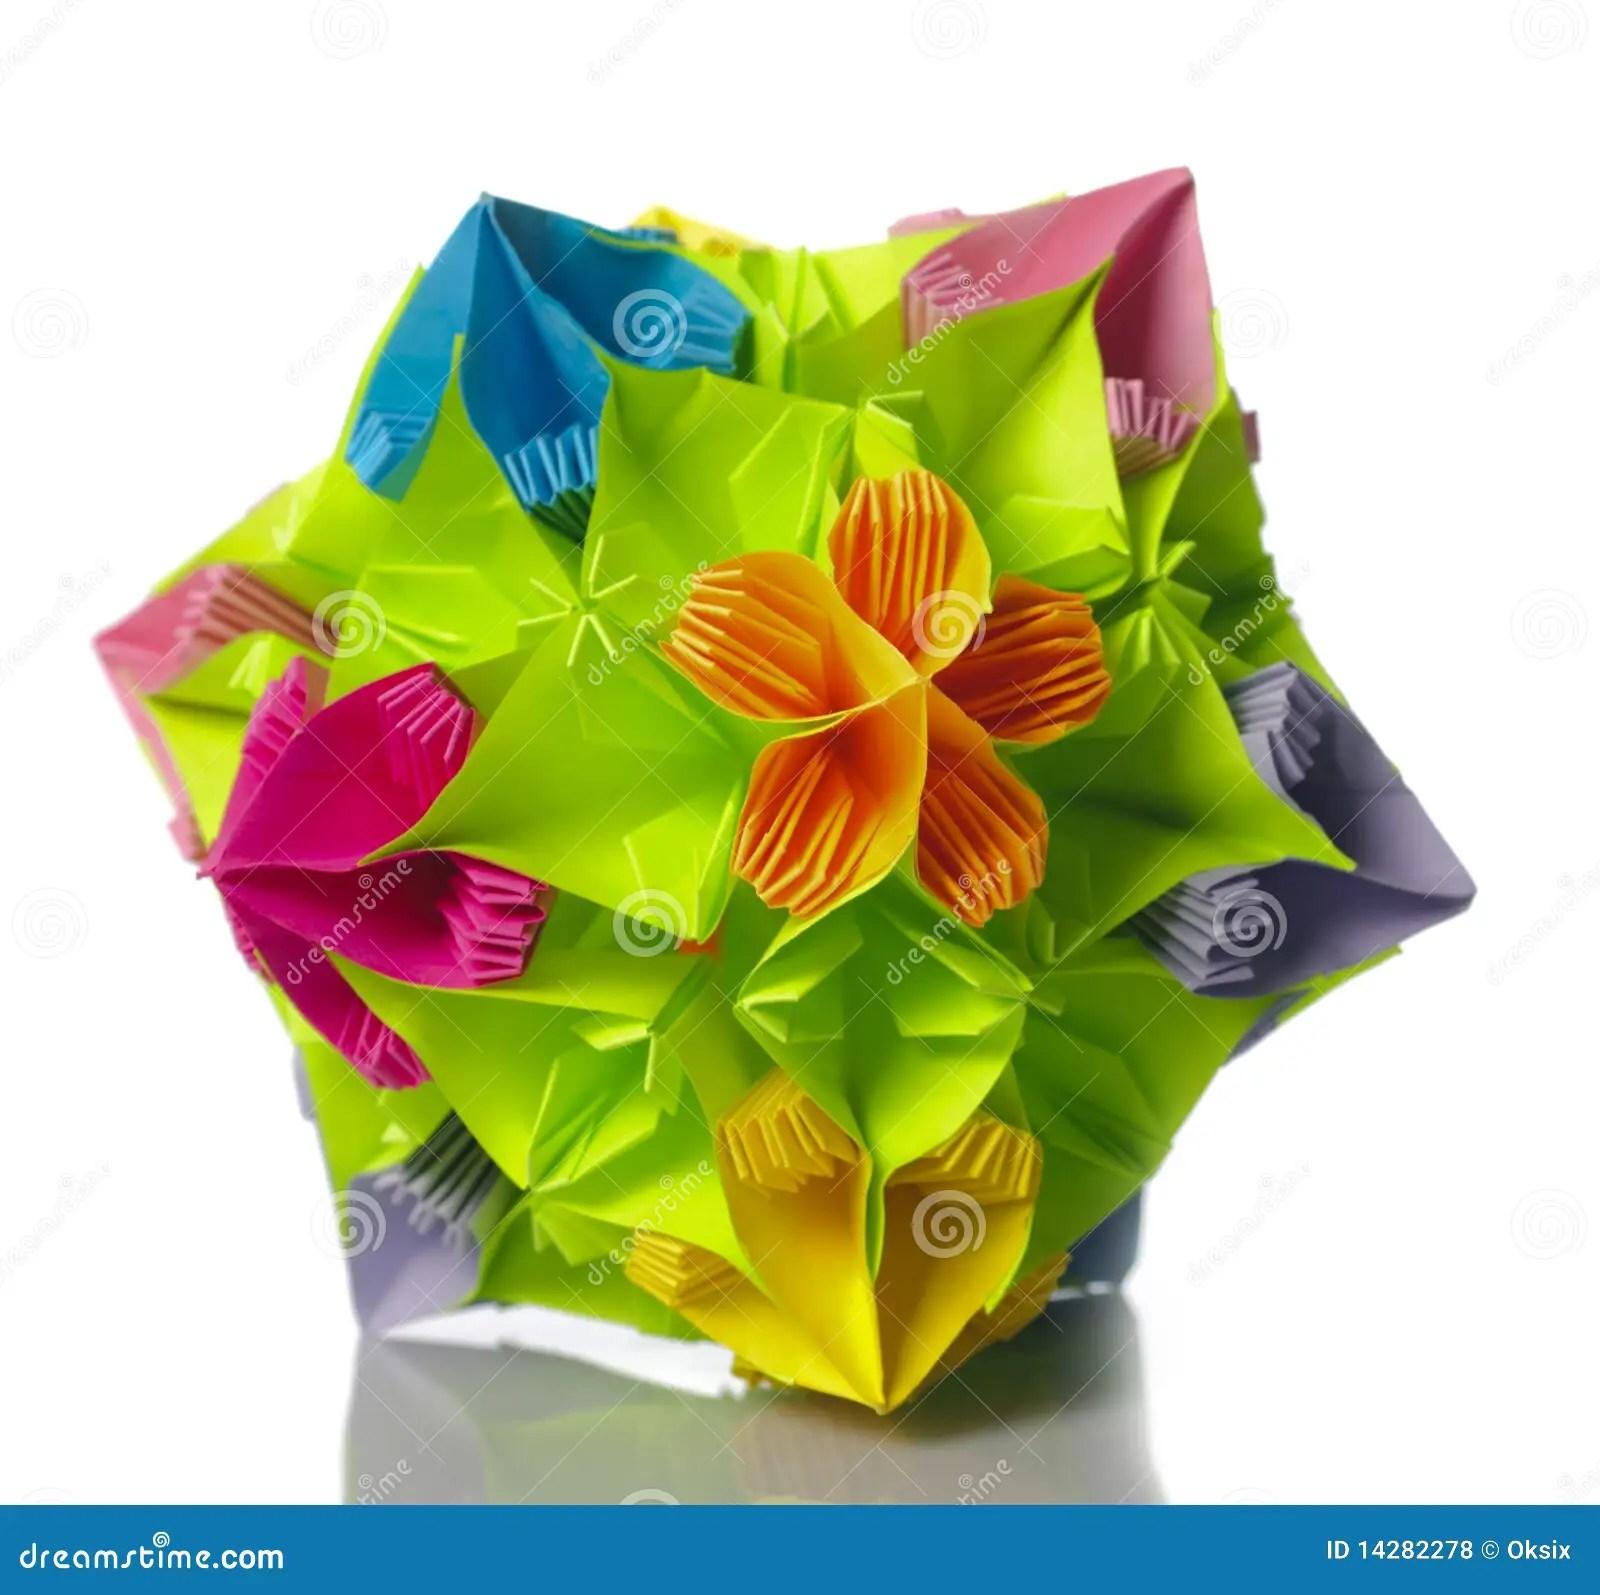 kusudama ball diagram 1992 volvo 240 radio wiring origami flower stock photo image of